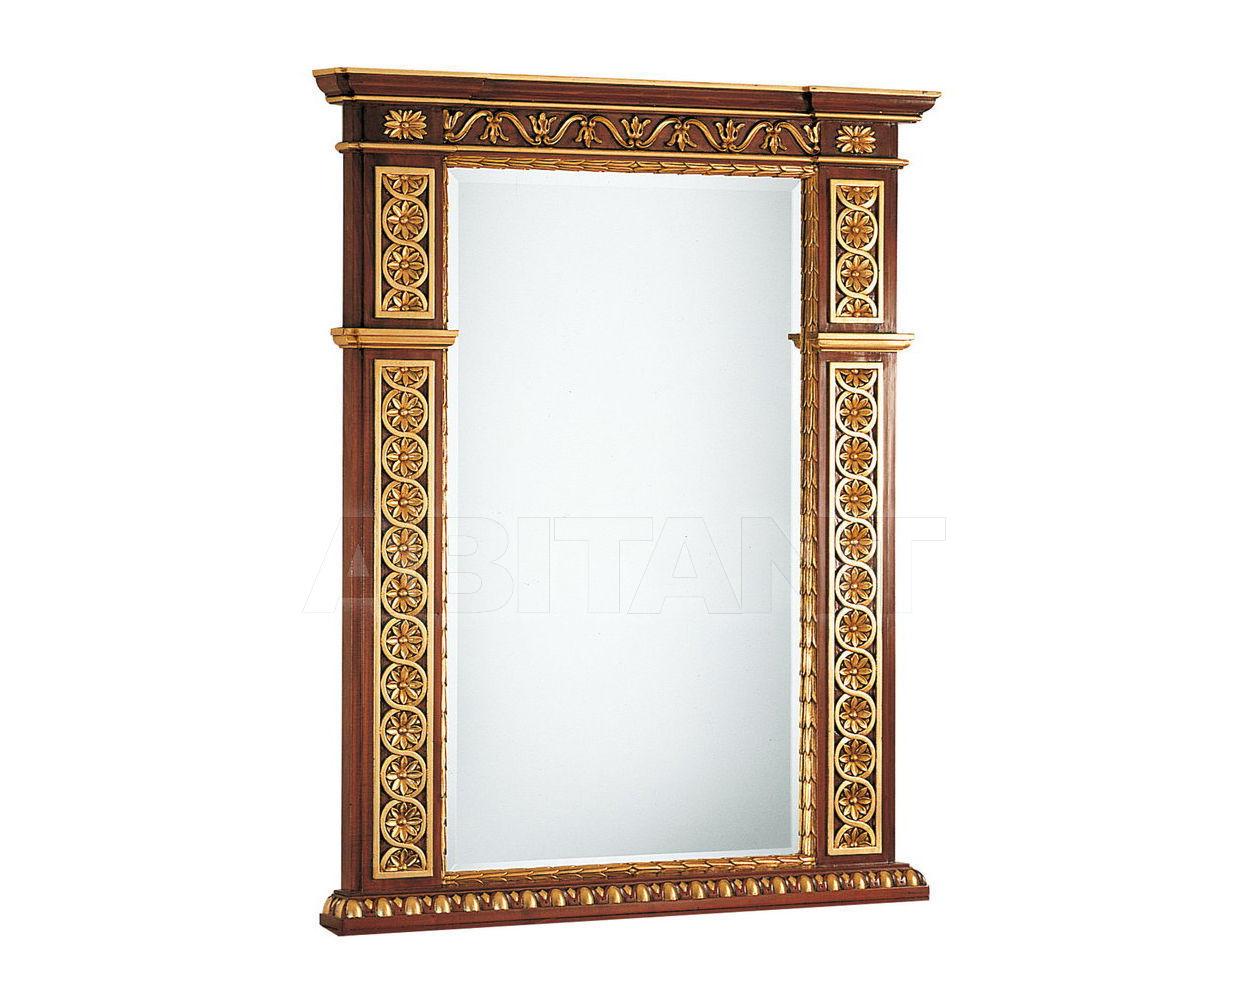 Купить Зеркало настенное Colombostile s.p.a. 2010 0109 SP1